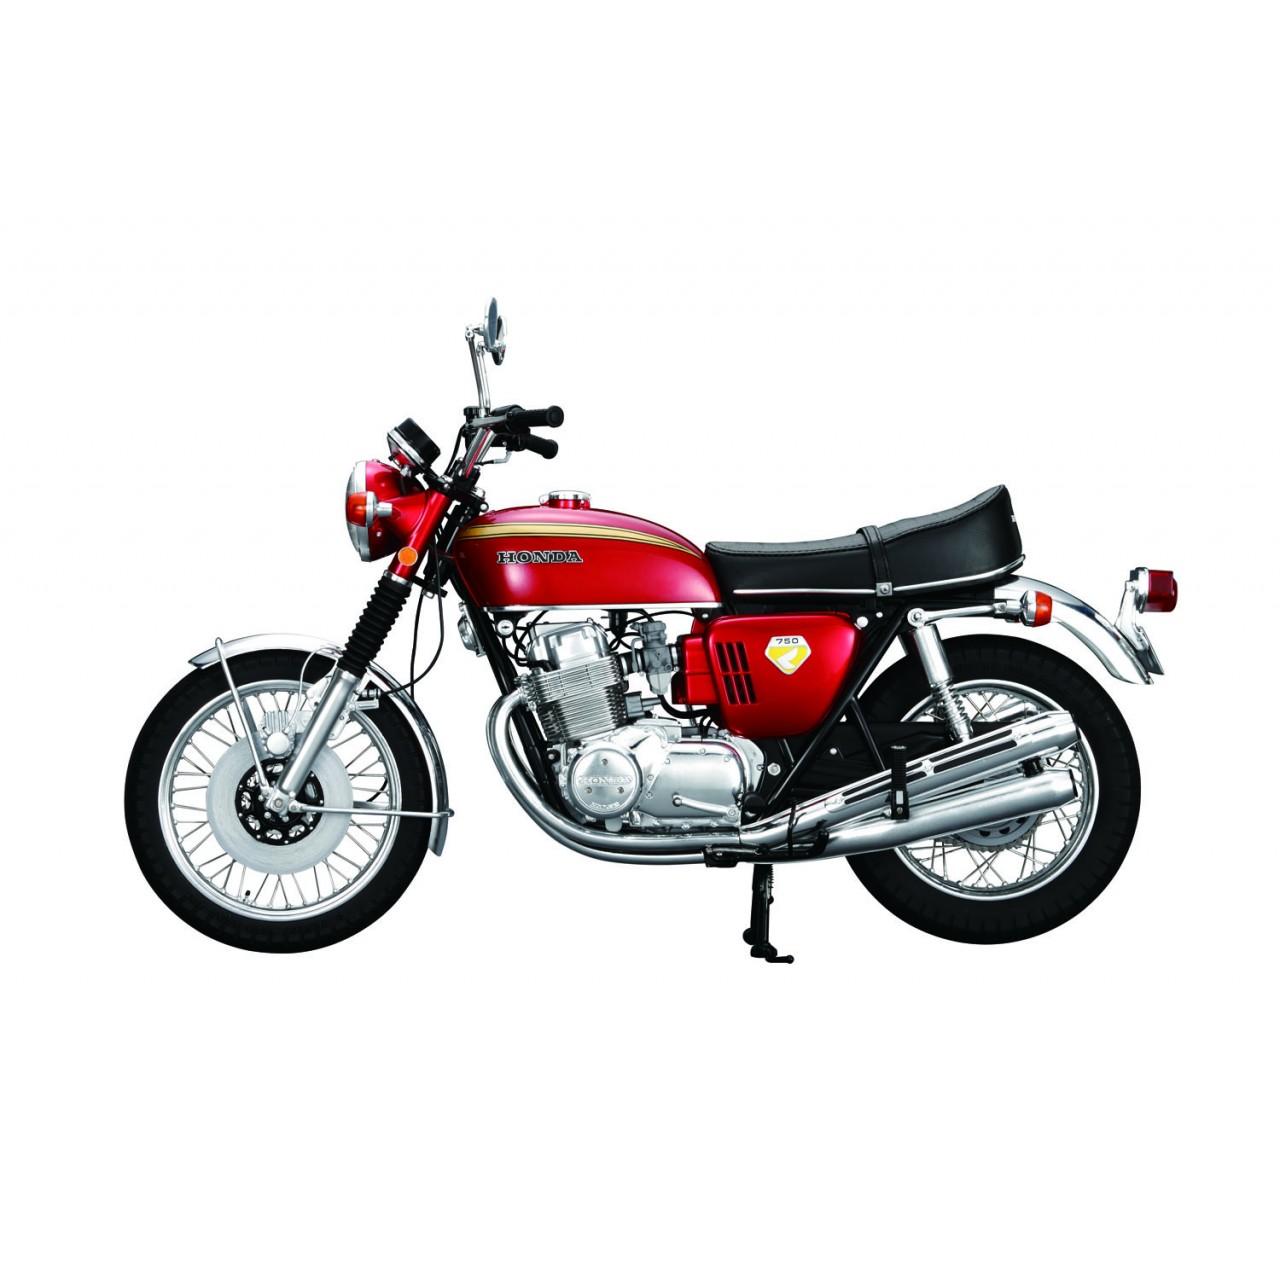 honda cb750 1 4 scale model motorbike full kit. Black Bedroom Furniture Sets. Home Design Ideas